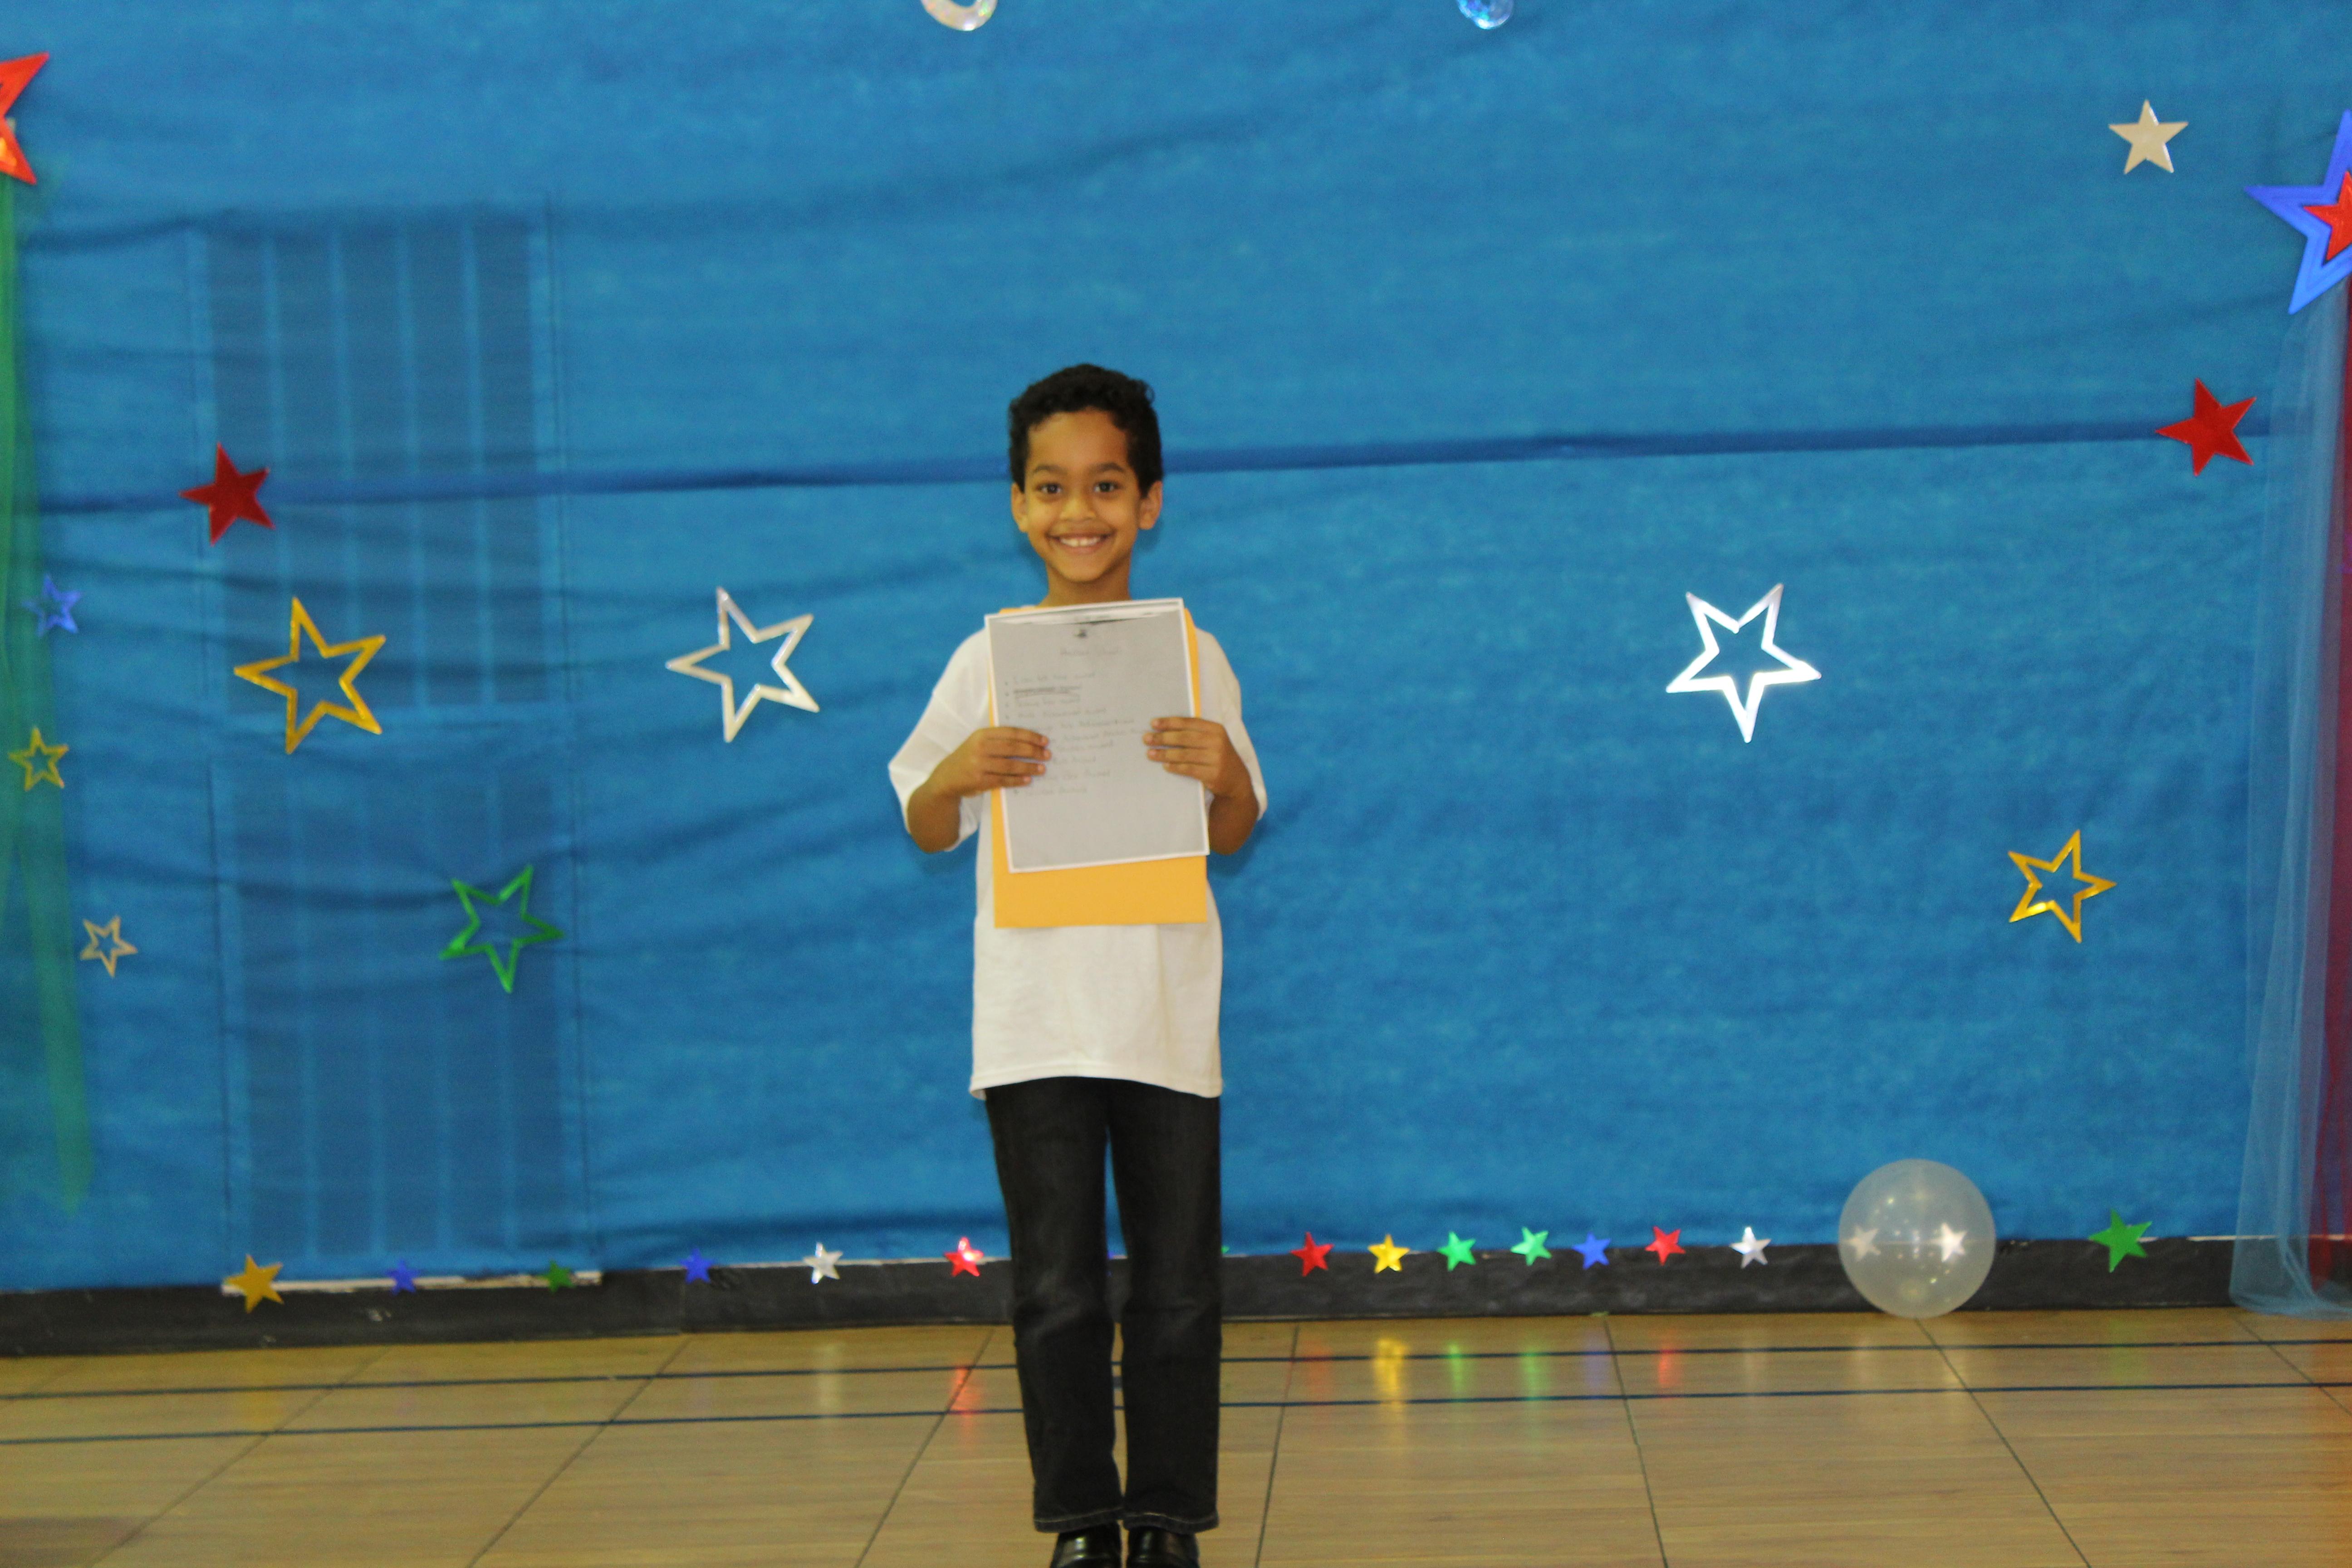 Hassan gets award